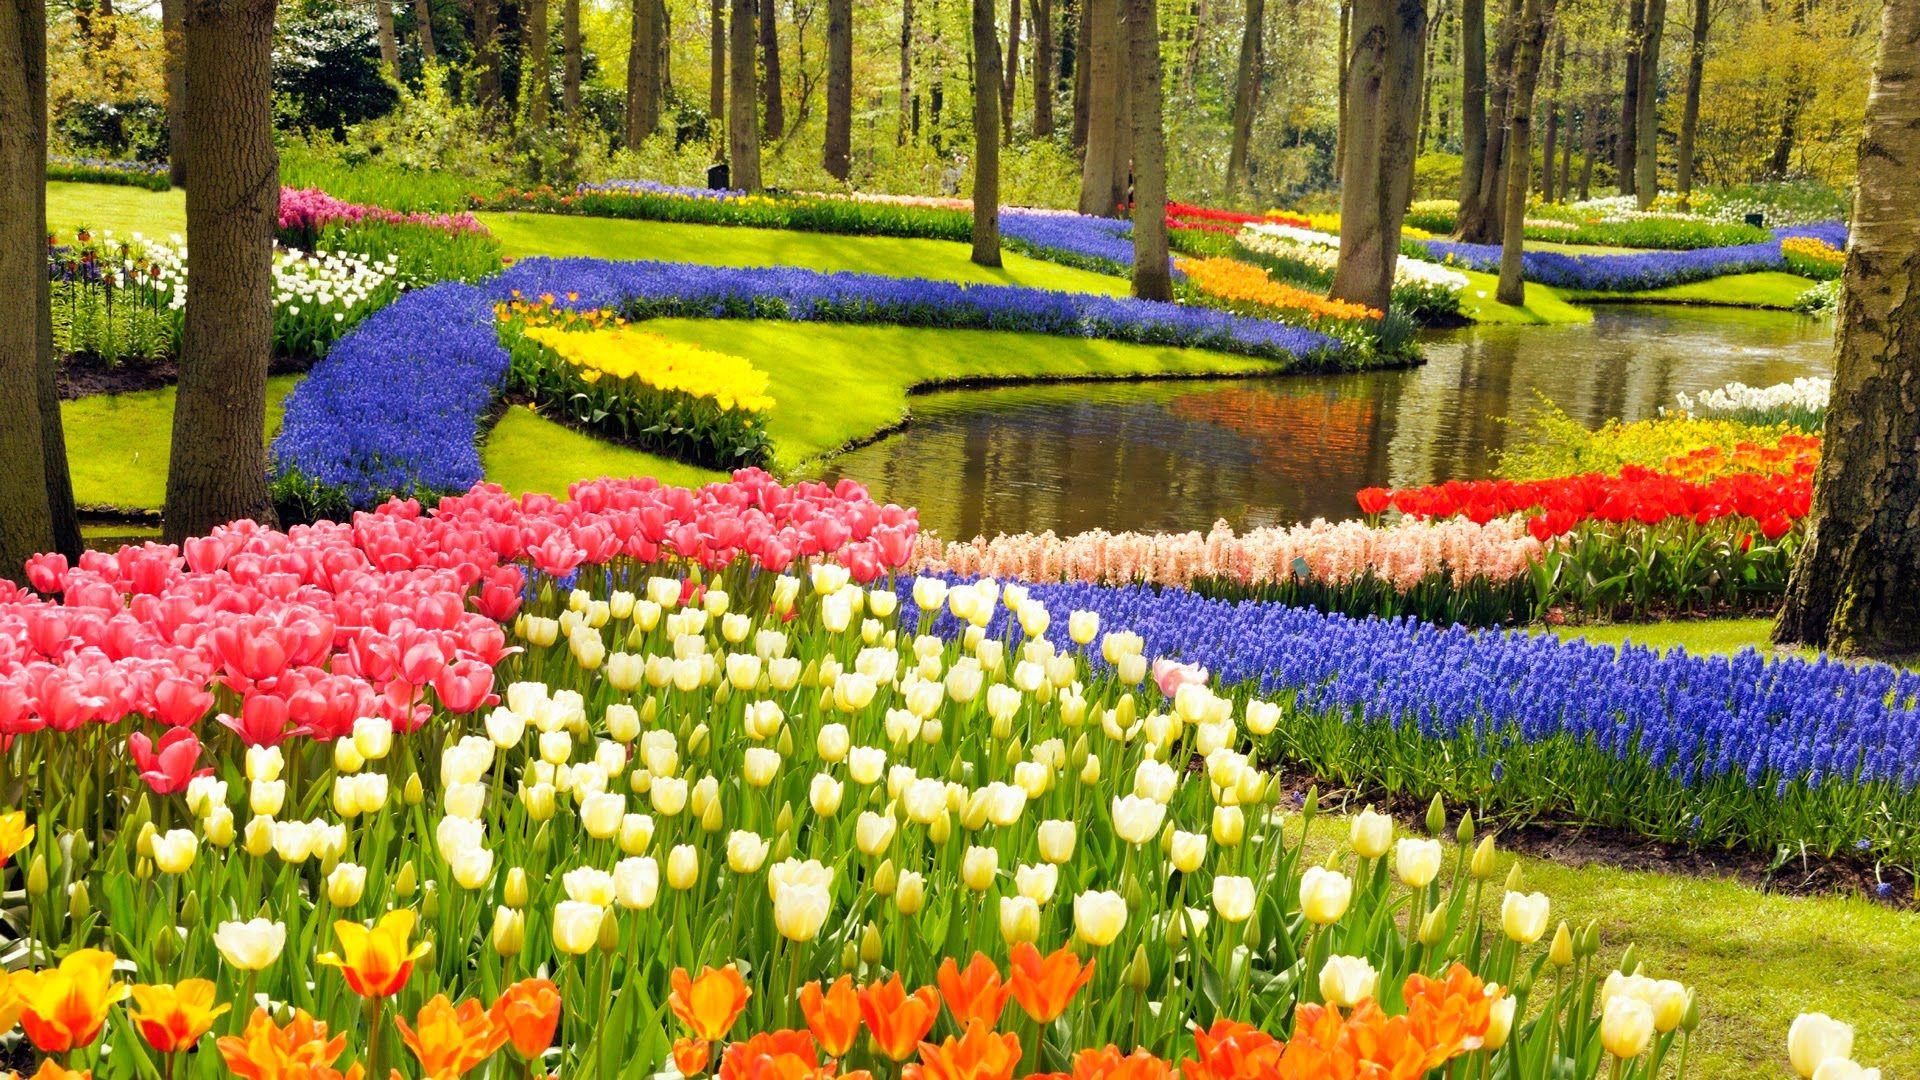 644c1c0db72d97fde7de75ae46224874 - Tours From Amsterdam To Keukenhof Gardens